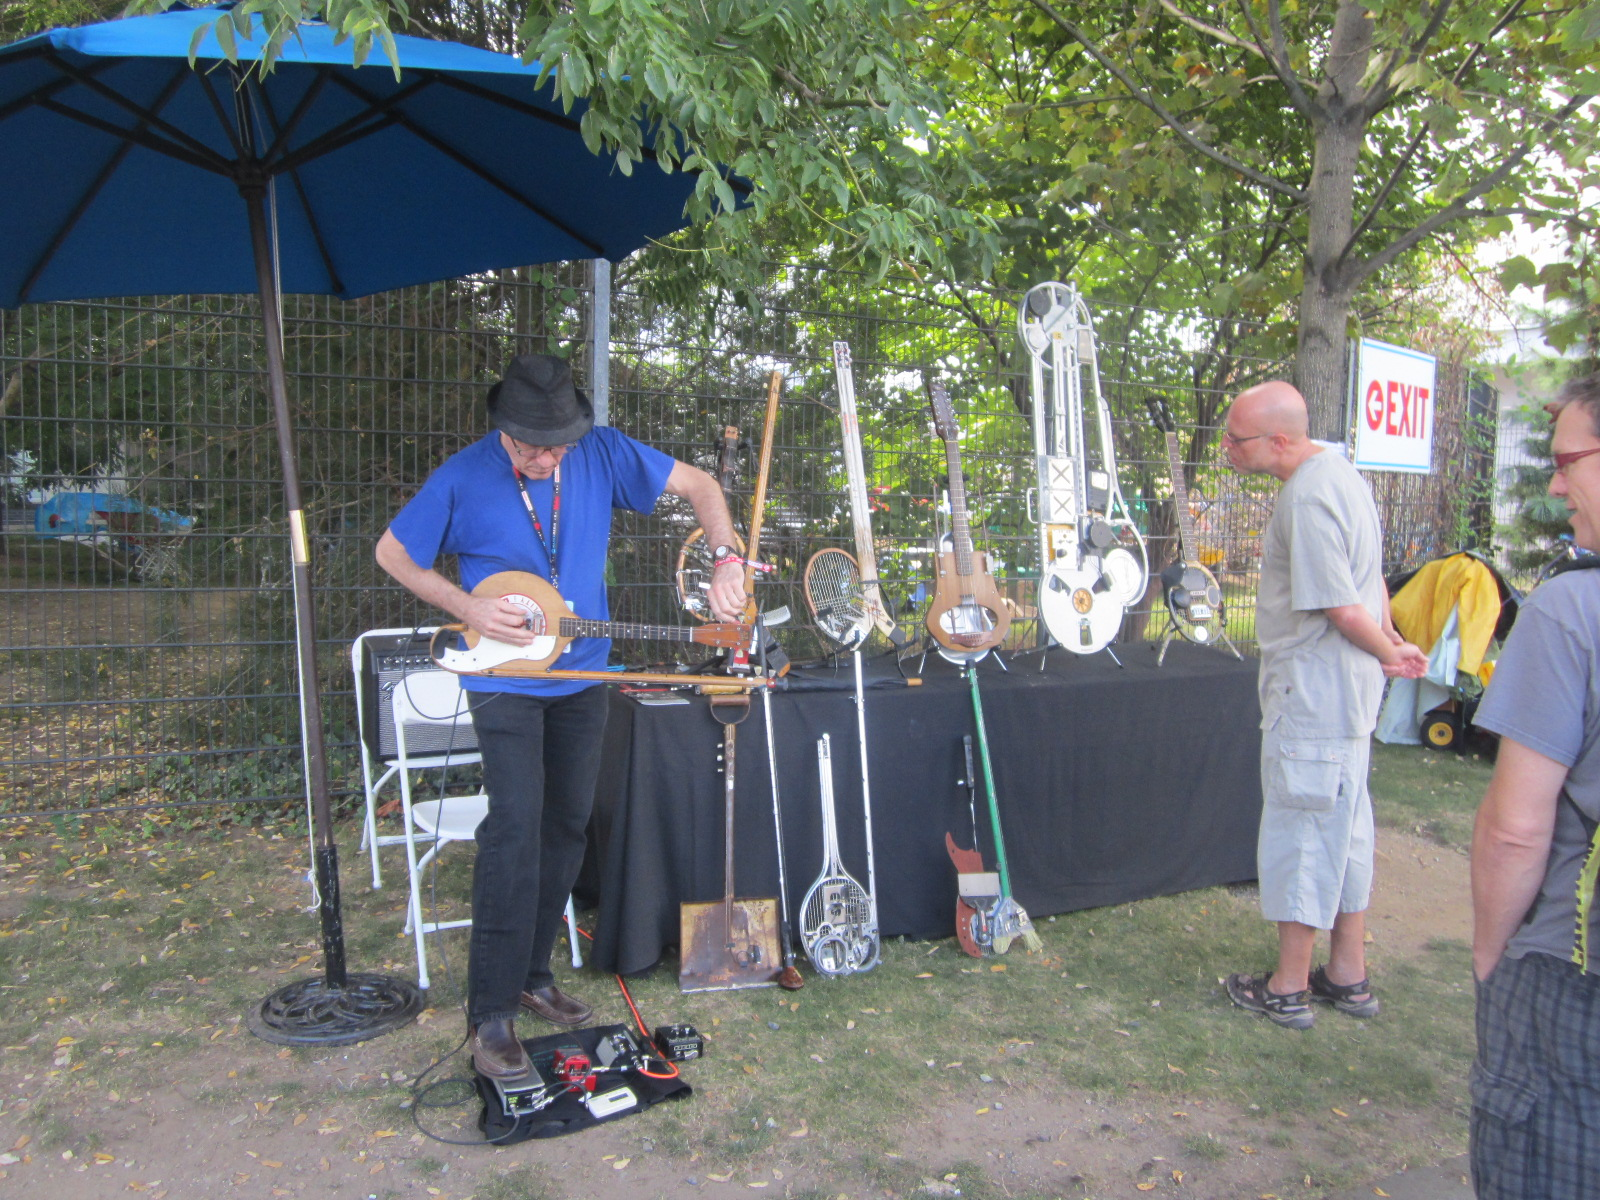 Ken Butler's Hybrid Instruments, Maker Faire NYC 2013